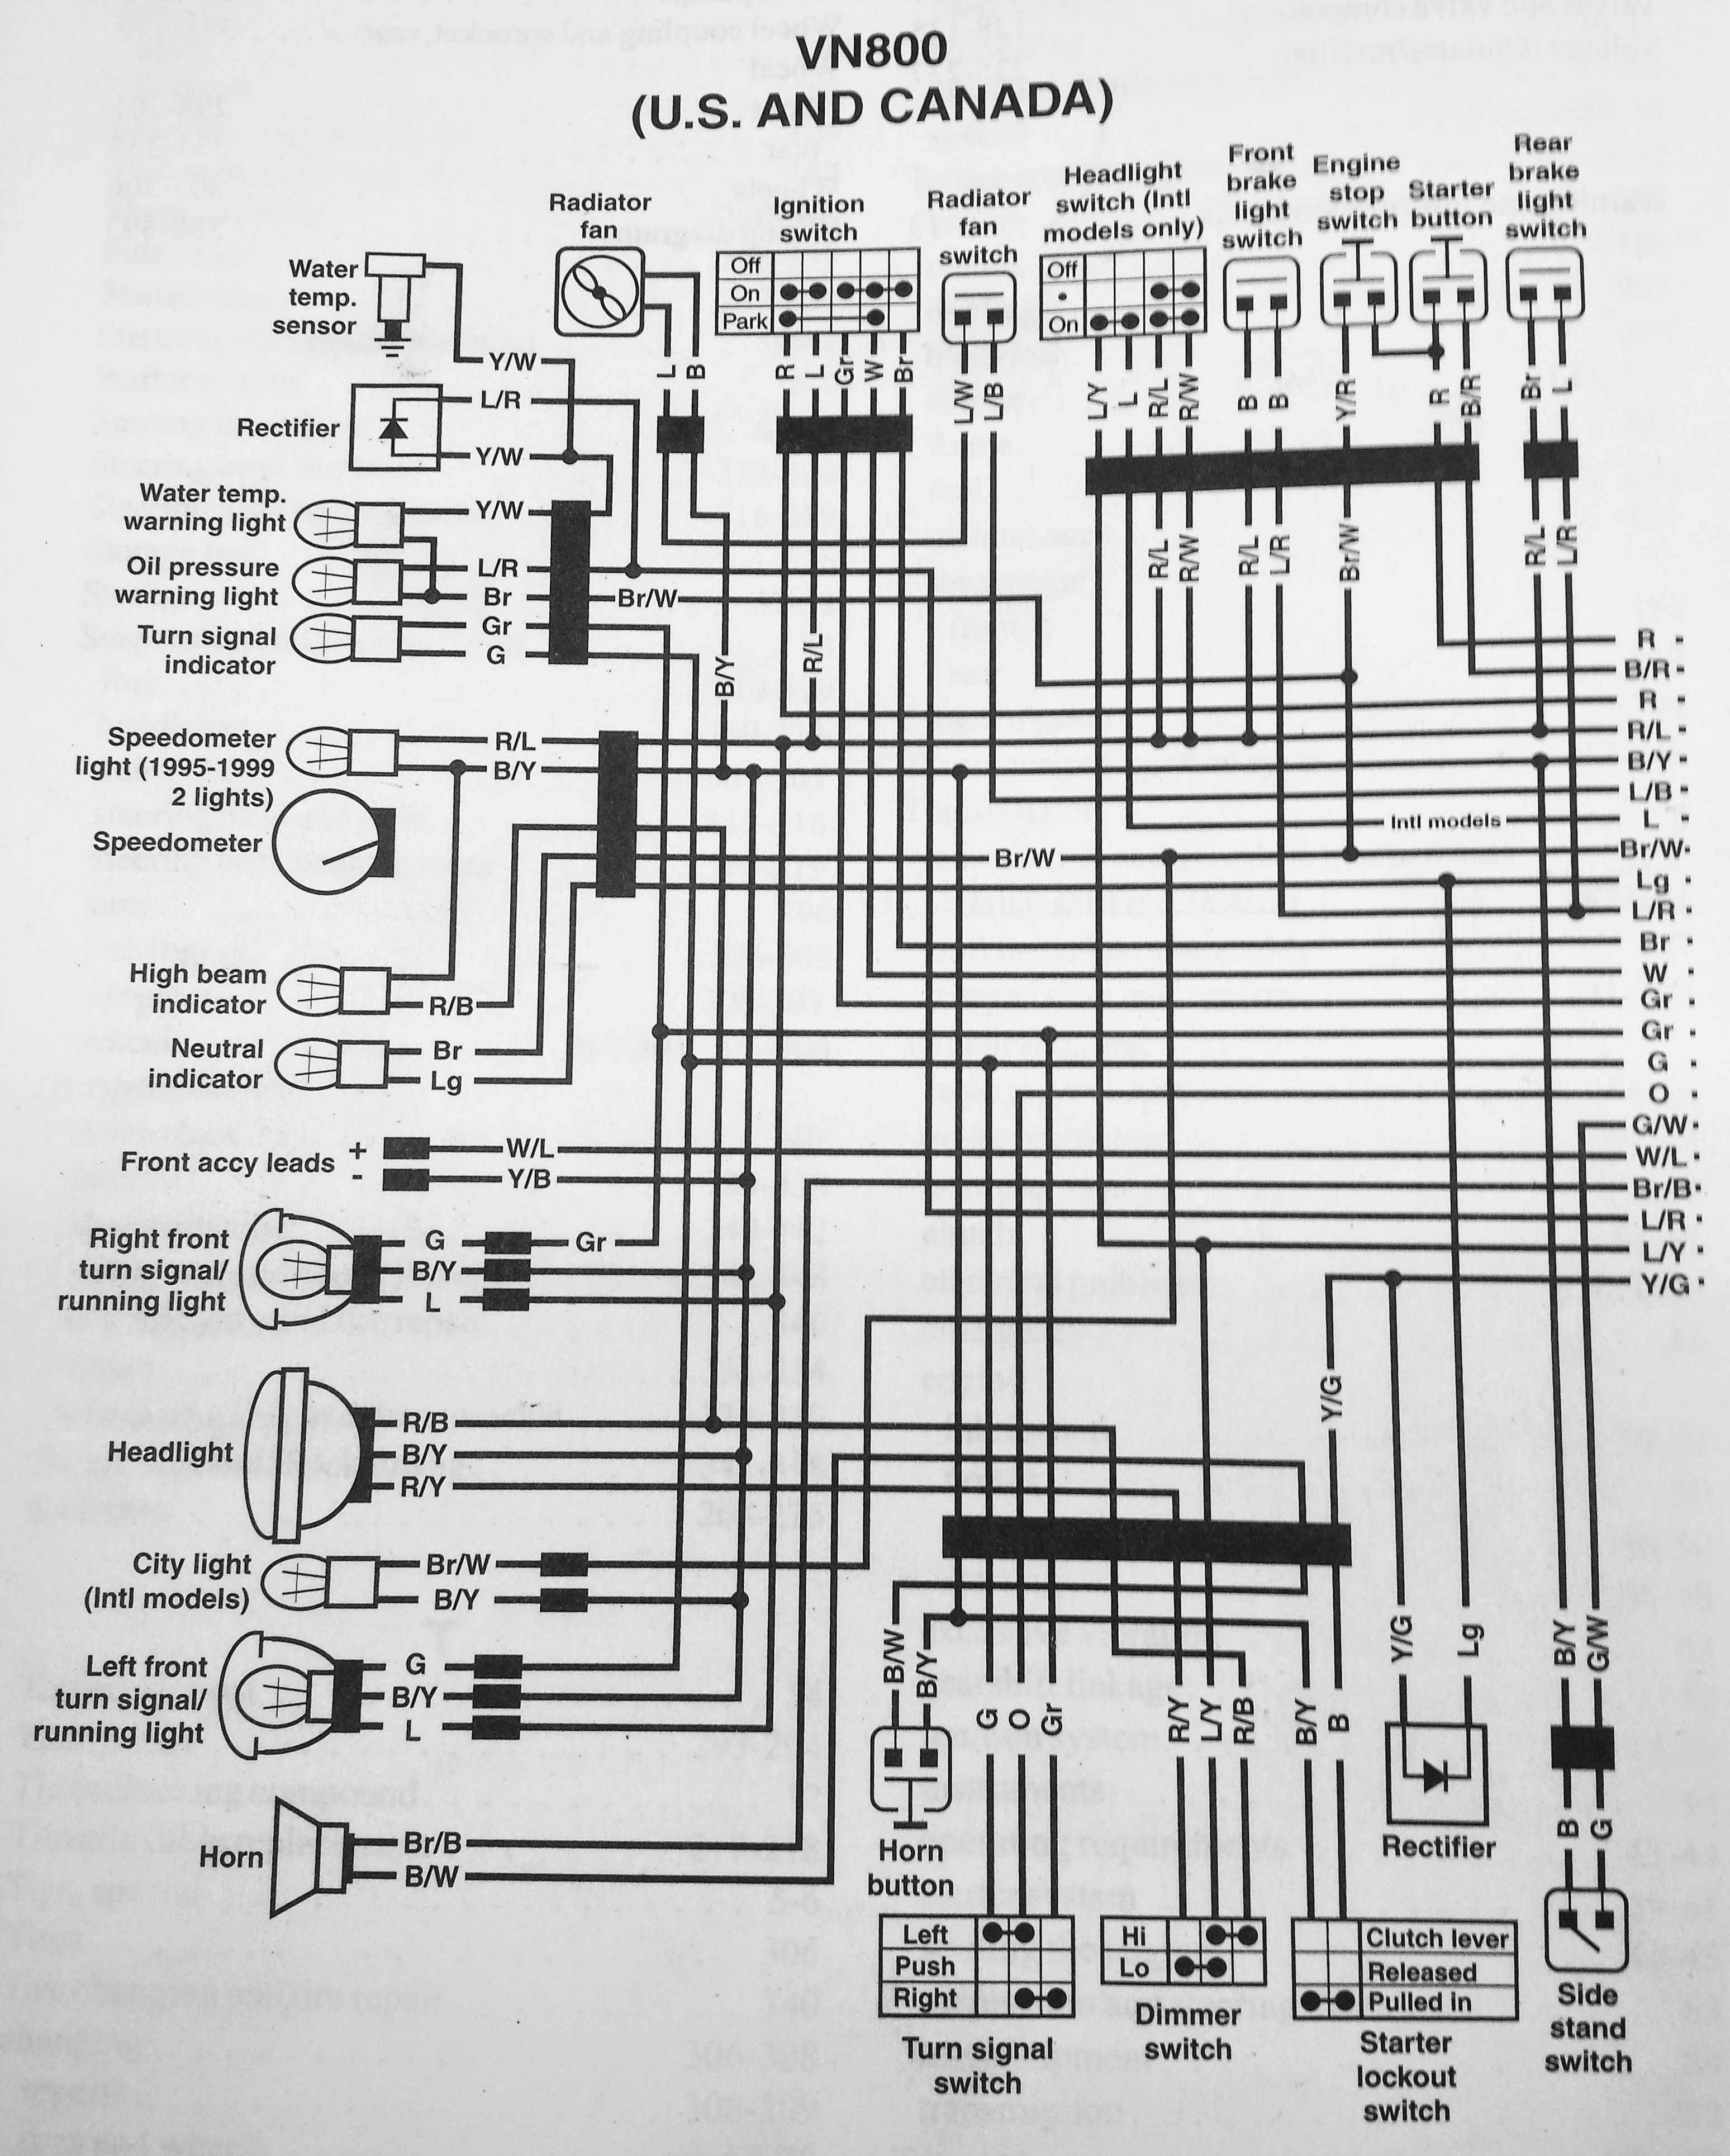 zx6e wiring diagram zx7r wiring diagram e3 wiring diagram  zx7r wiring diagram e3 wiring diagram